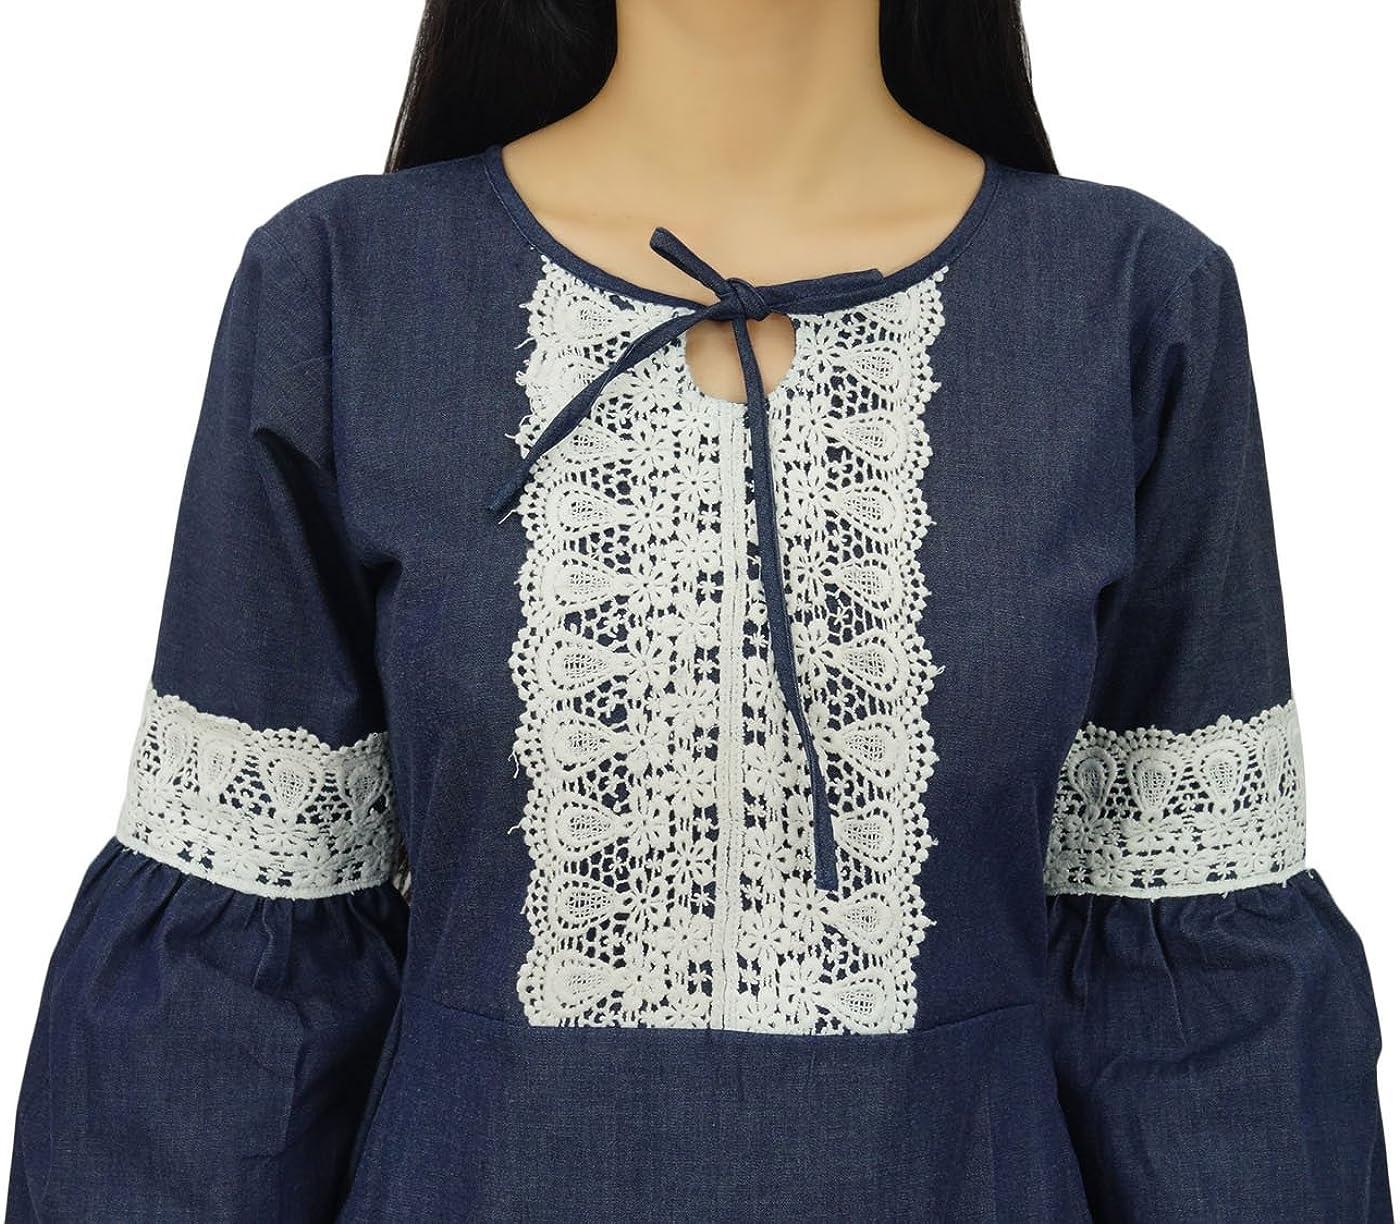 Bimba Womens Retro Style Denim Dress Mid-Calf Boho Dress with Lace Detail